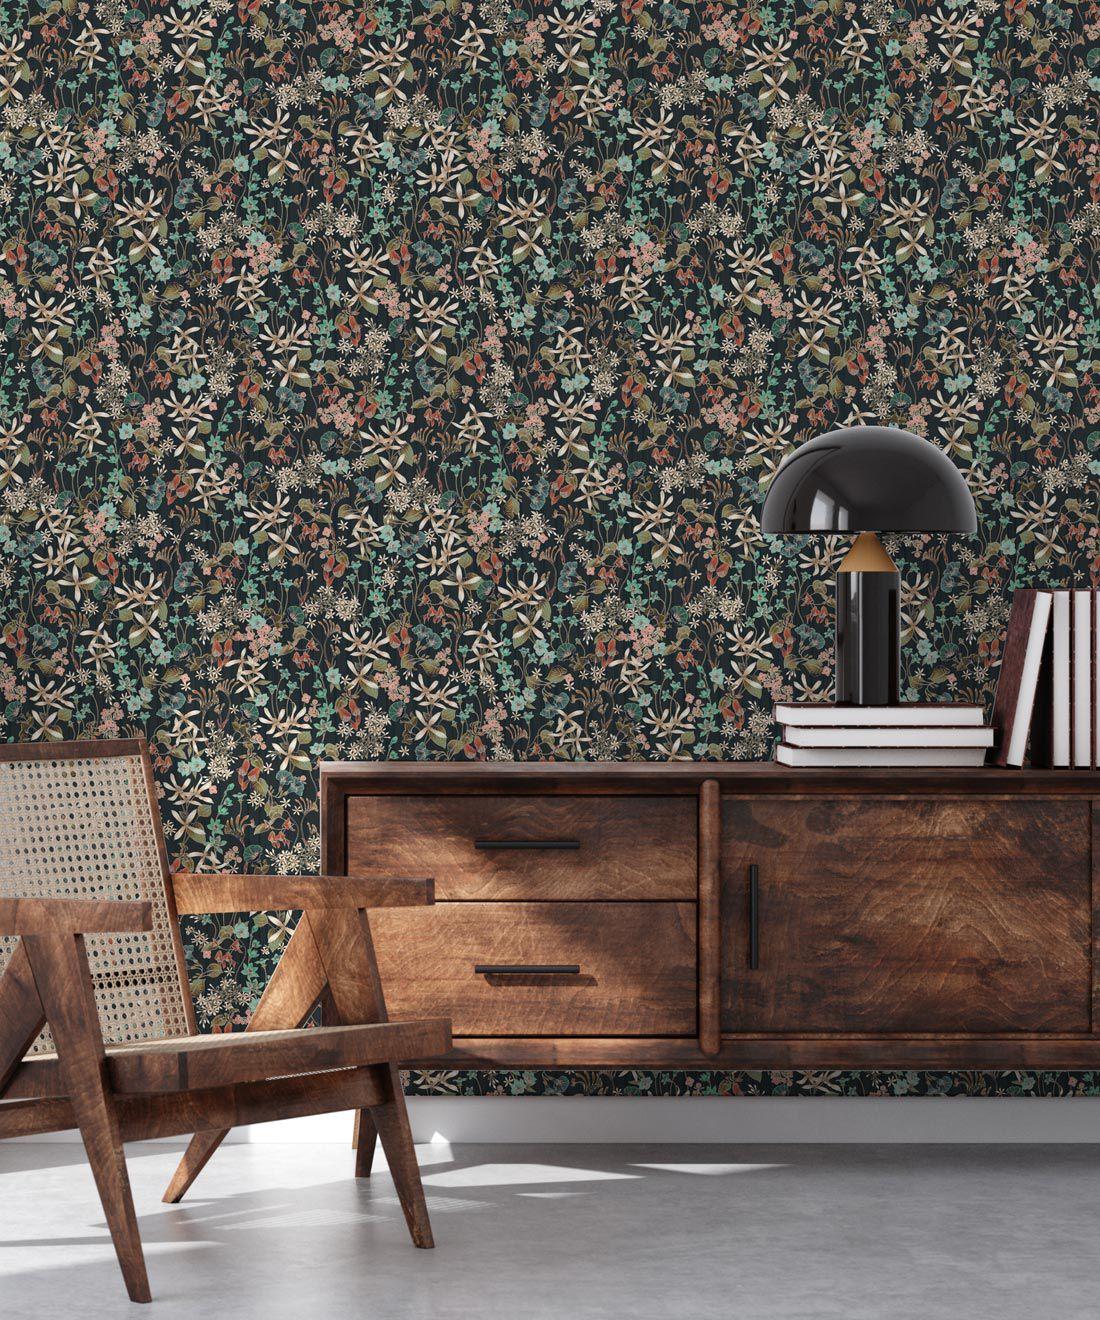 County Flowers Wallpaper • Eloise Short • Vintage Floral Wallpaper •Granny Chic Wallpaper • Grandmillennial Style Wallpaper •Charcoal •Insitu